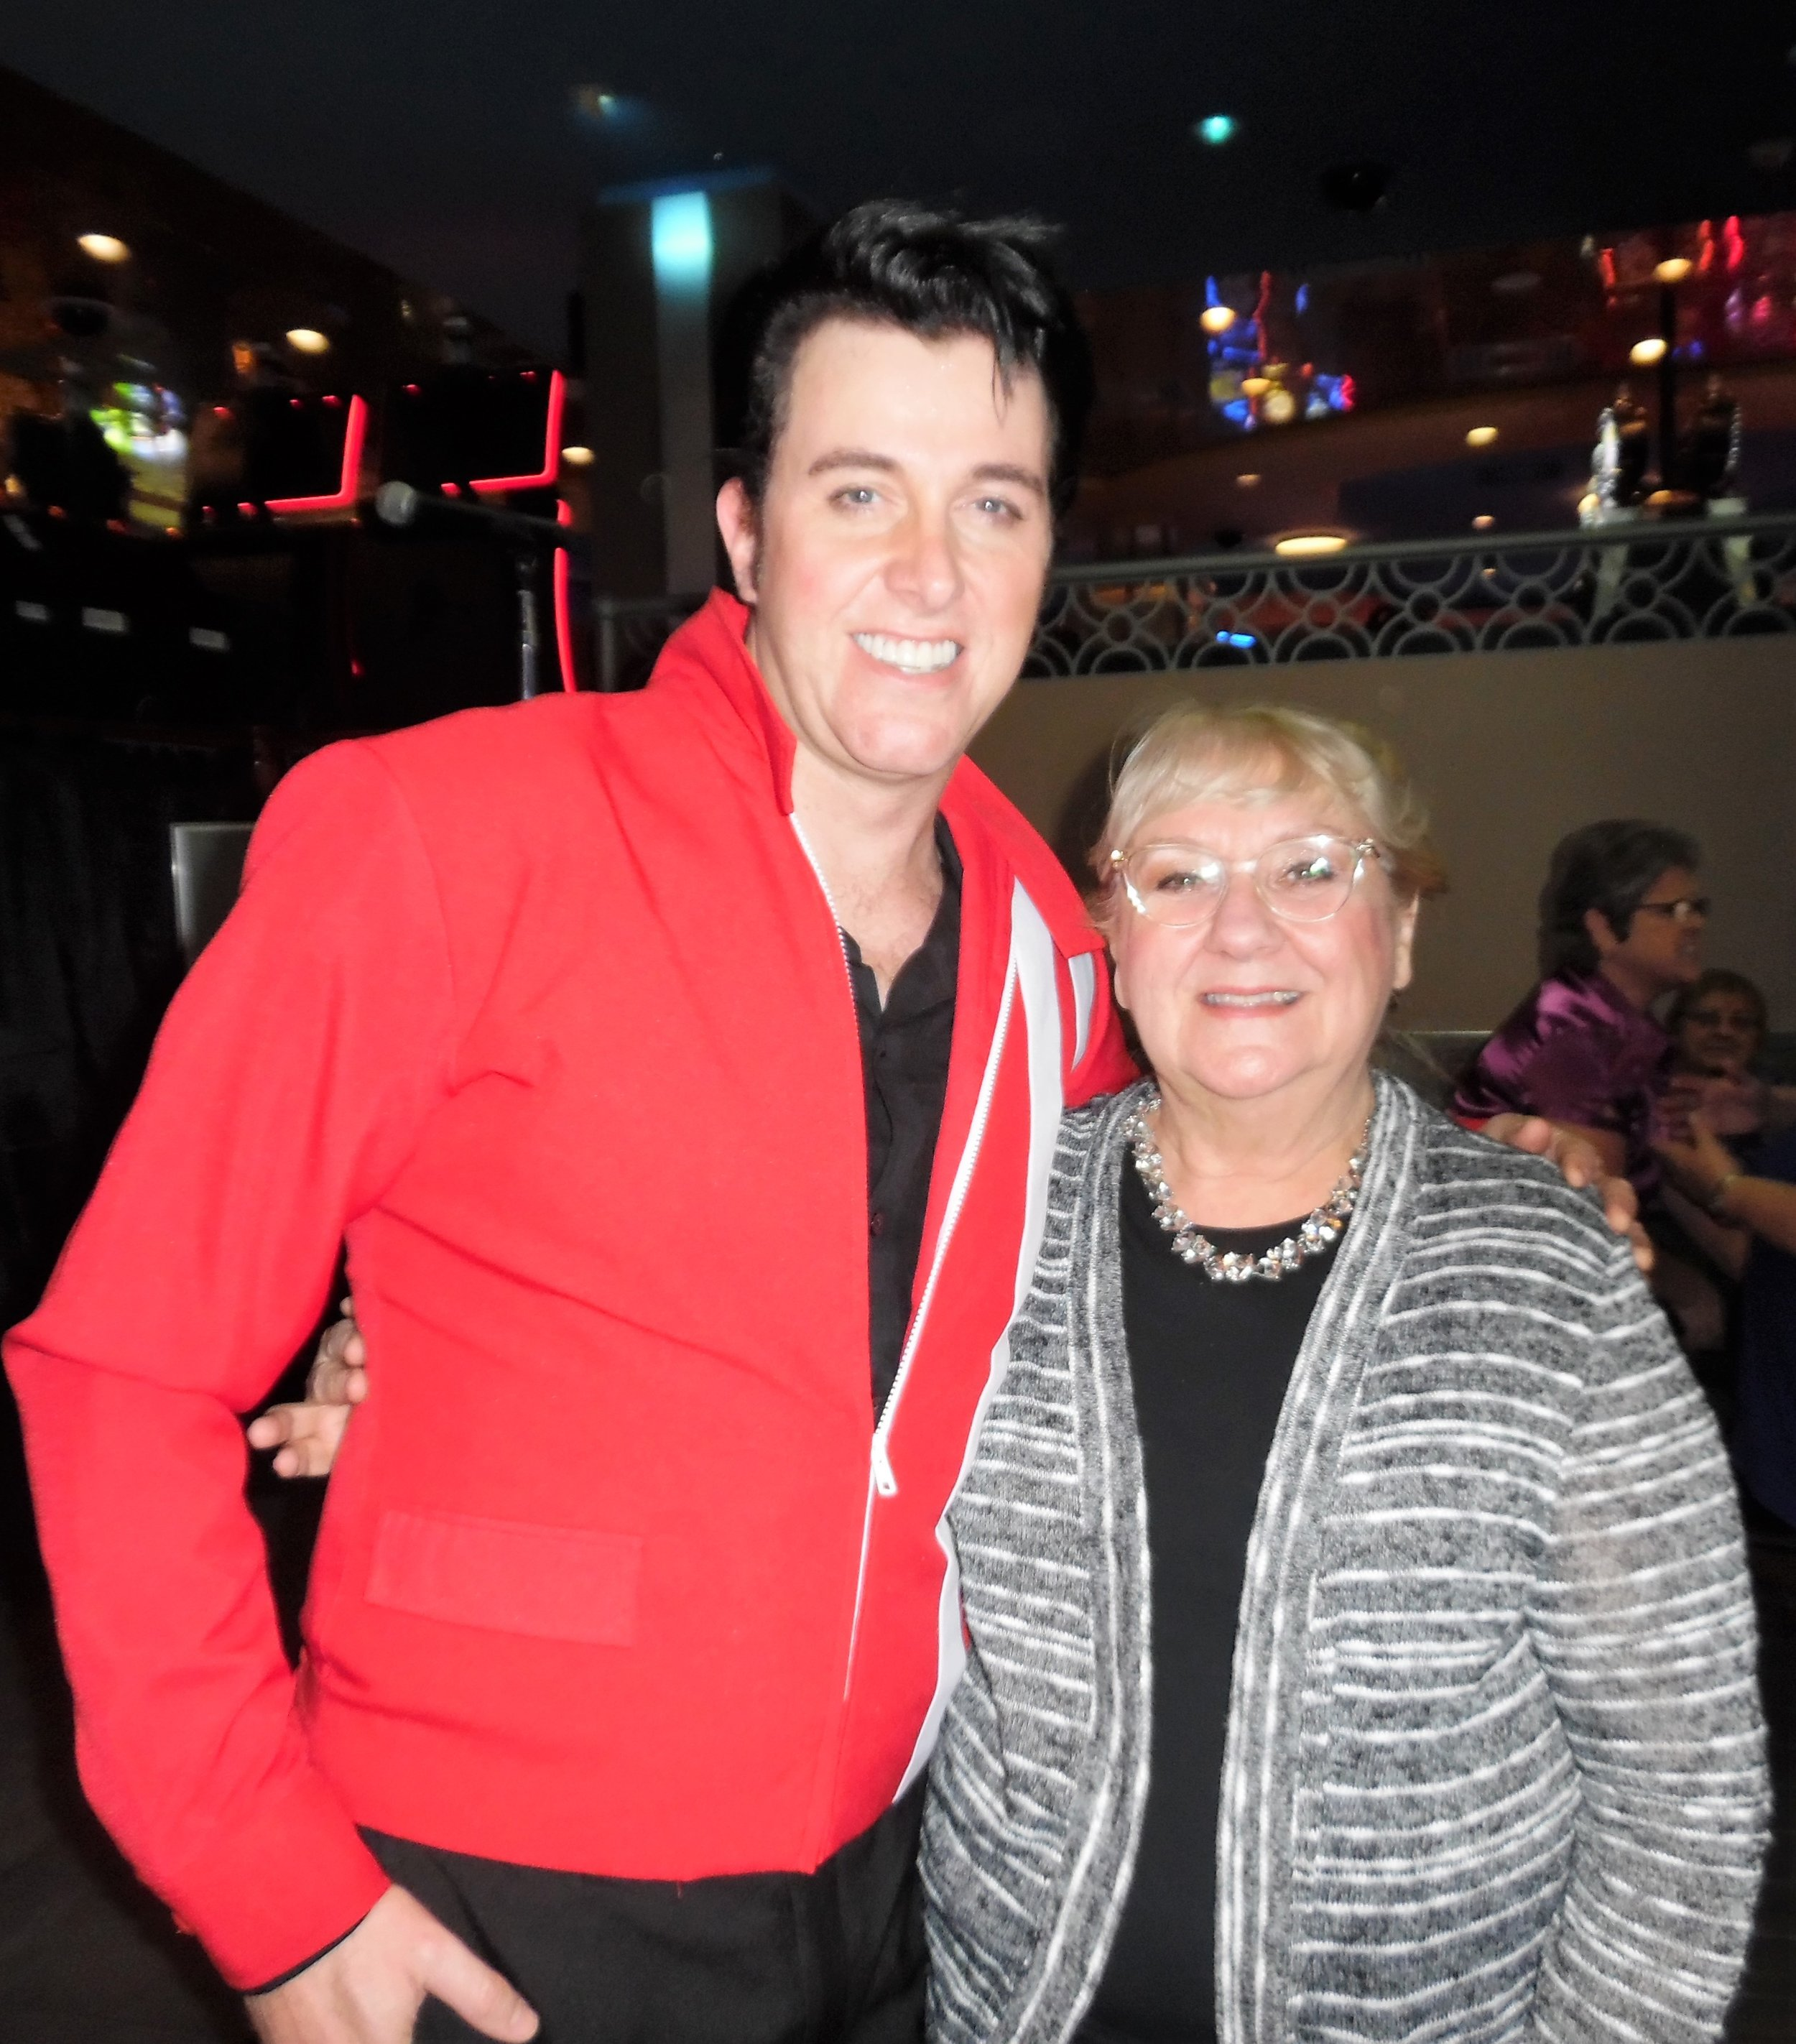 Matt  looked great in his red Speedway jacket. October 27th, 2017.